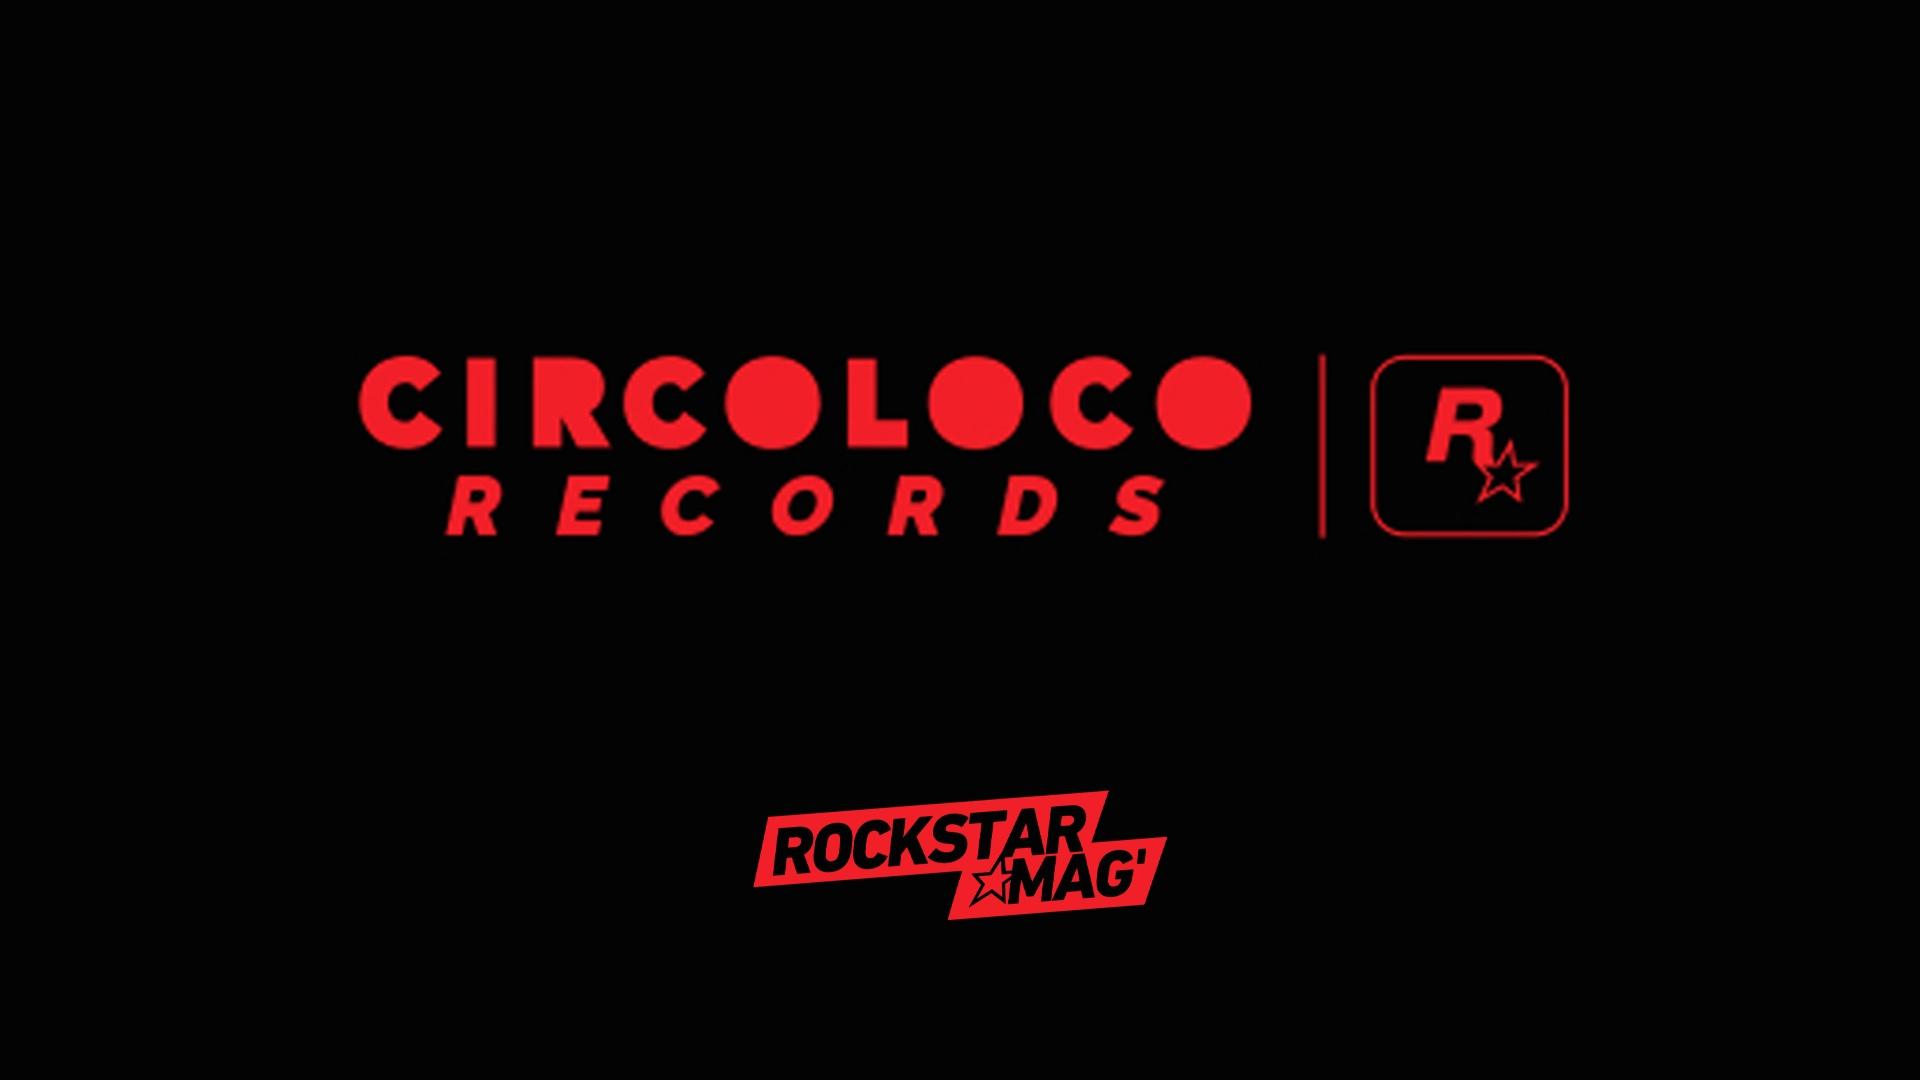 CircoLoco Records Rockstar Mag'